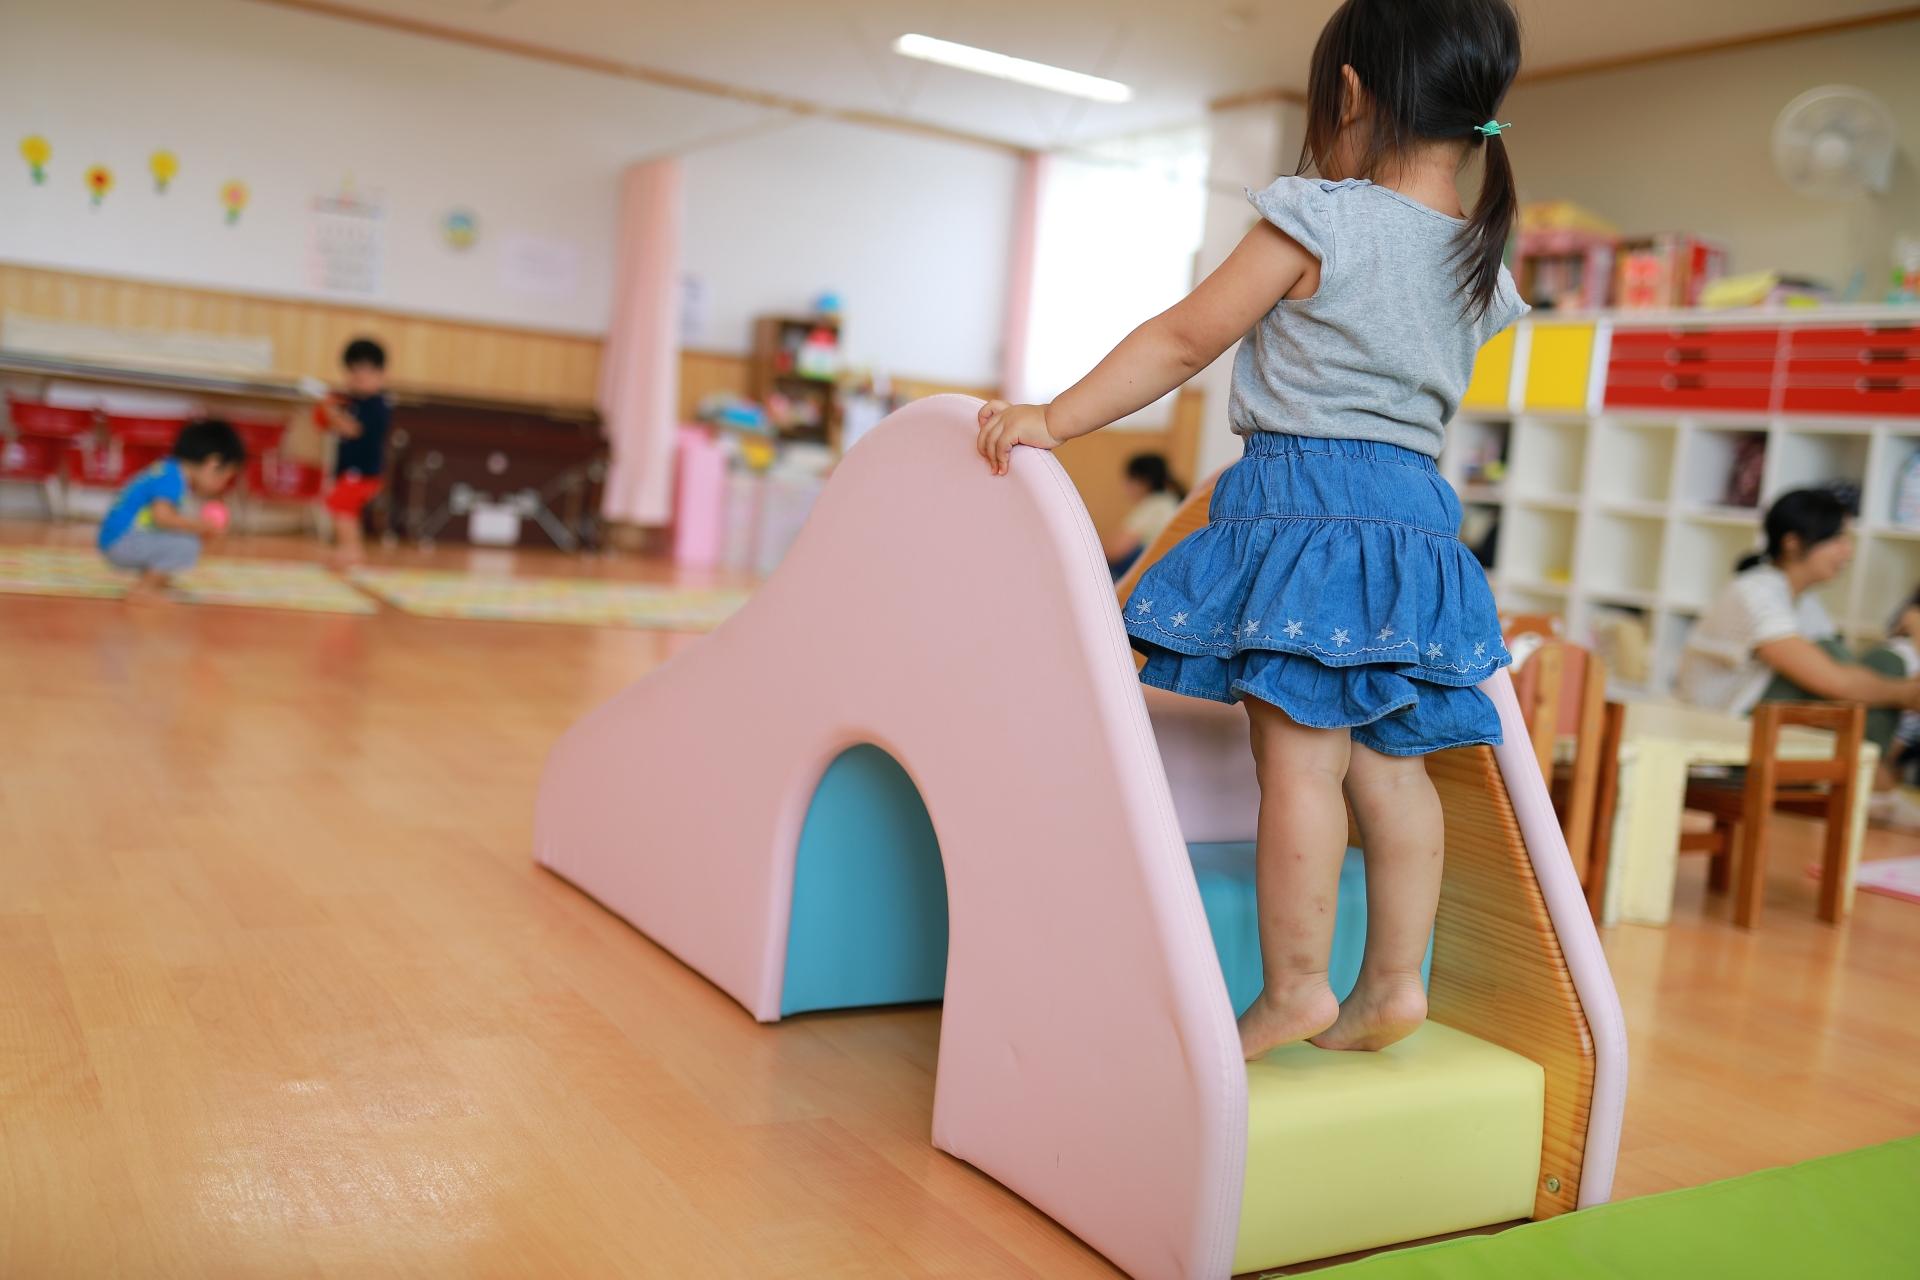 nursery without authorization